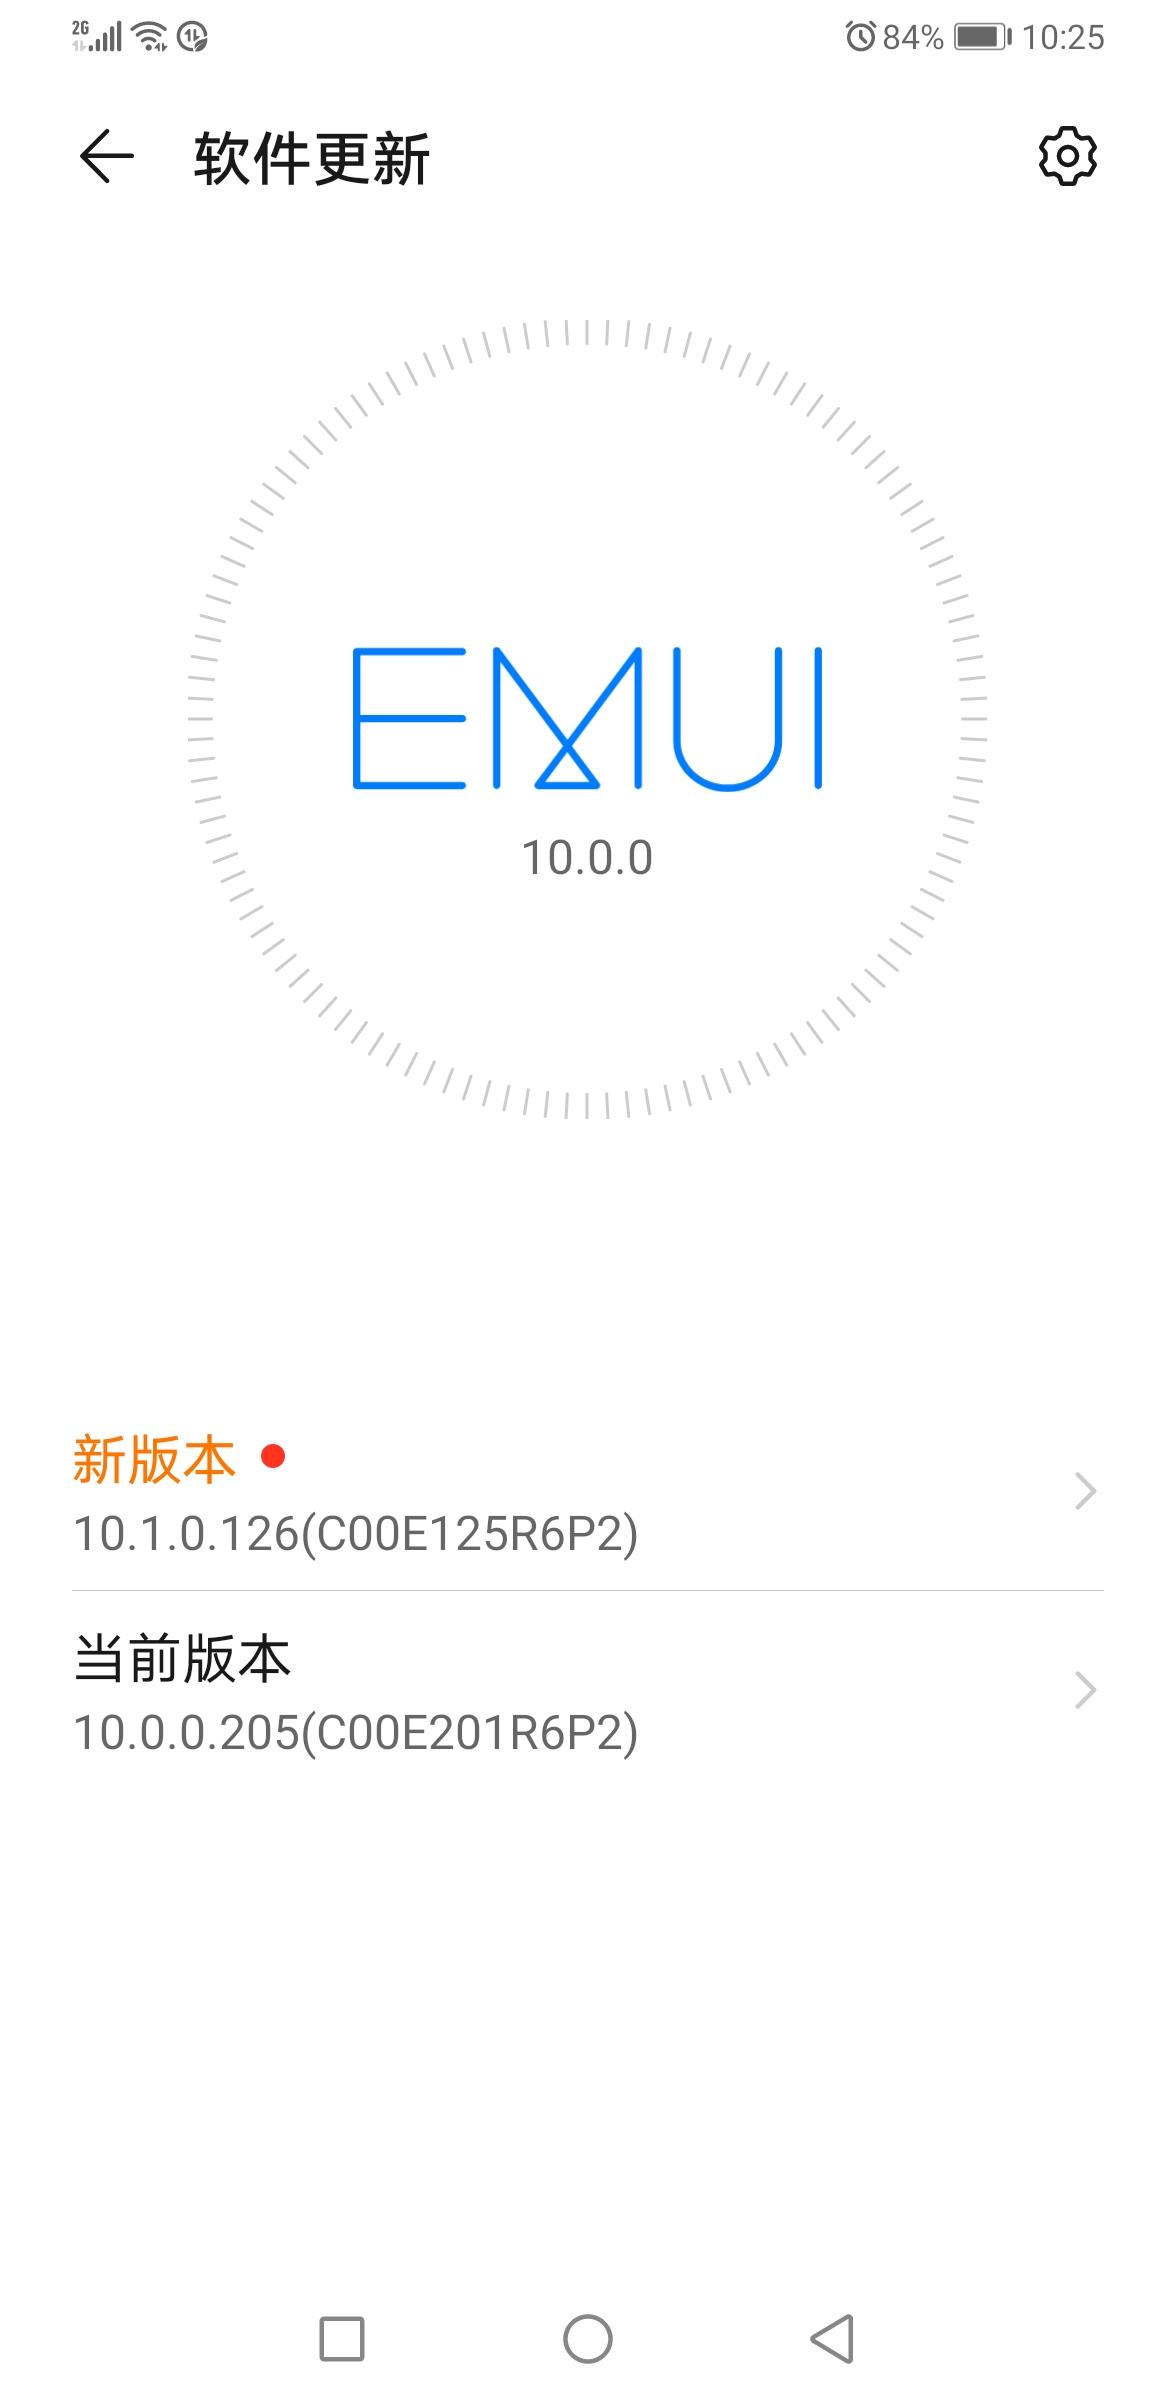 Screenshot_20200515_102526_com.huawei.android.hwouc.jpg